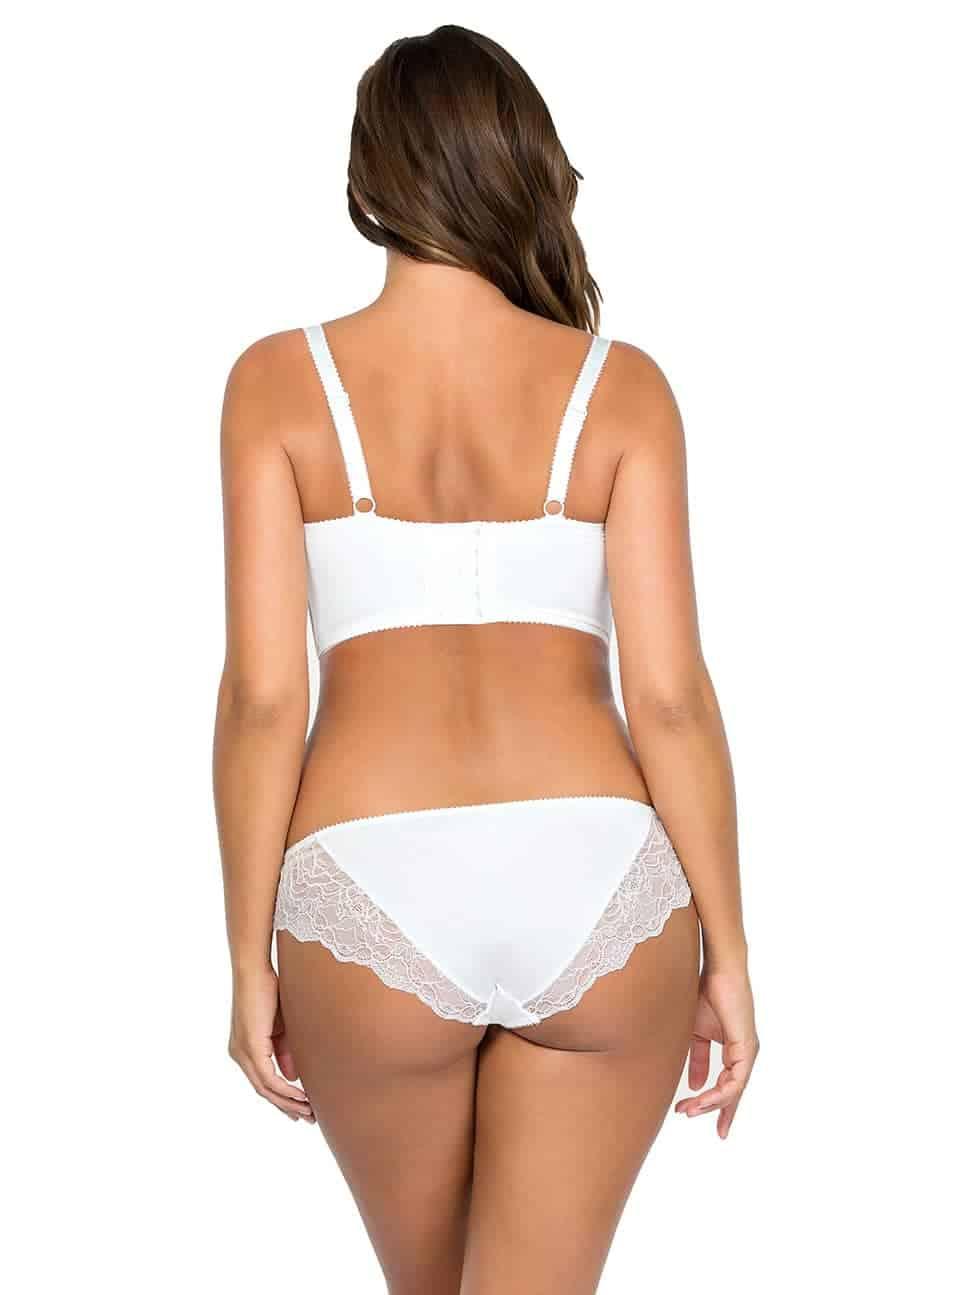 Elissa Unlined Wire BraP5012 BrazilianThongP5014 PearlWhite Back - Elissa Bikini - Pearl White - P5013